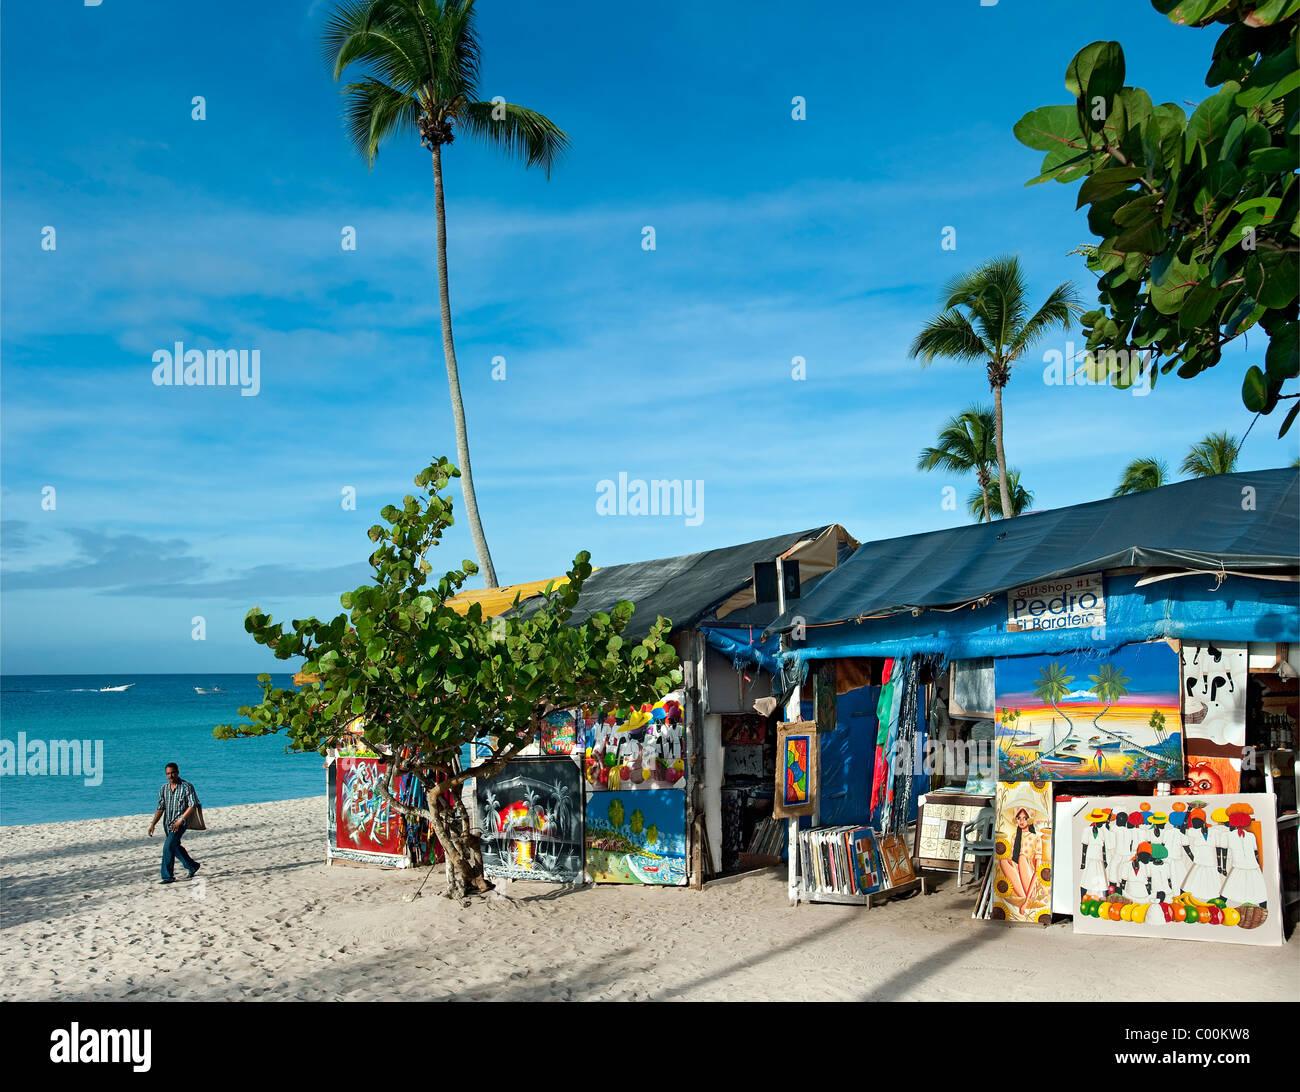 Souvenir shops on beach at Bayahibe, Dominican Republic - Stock Image